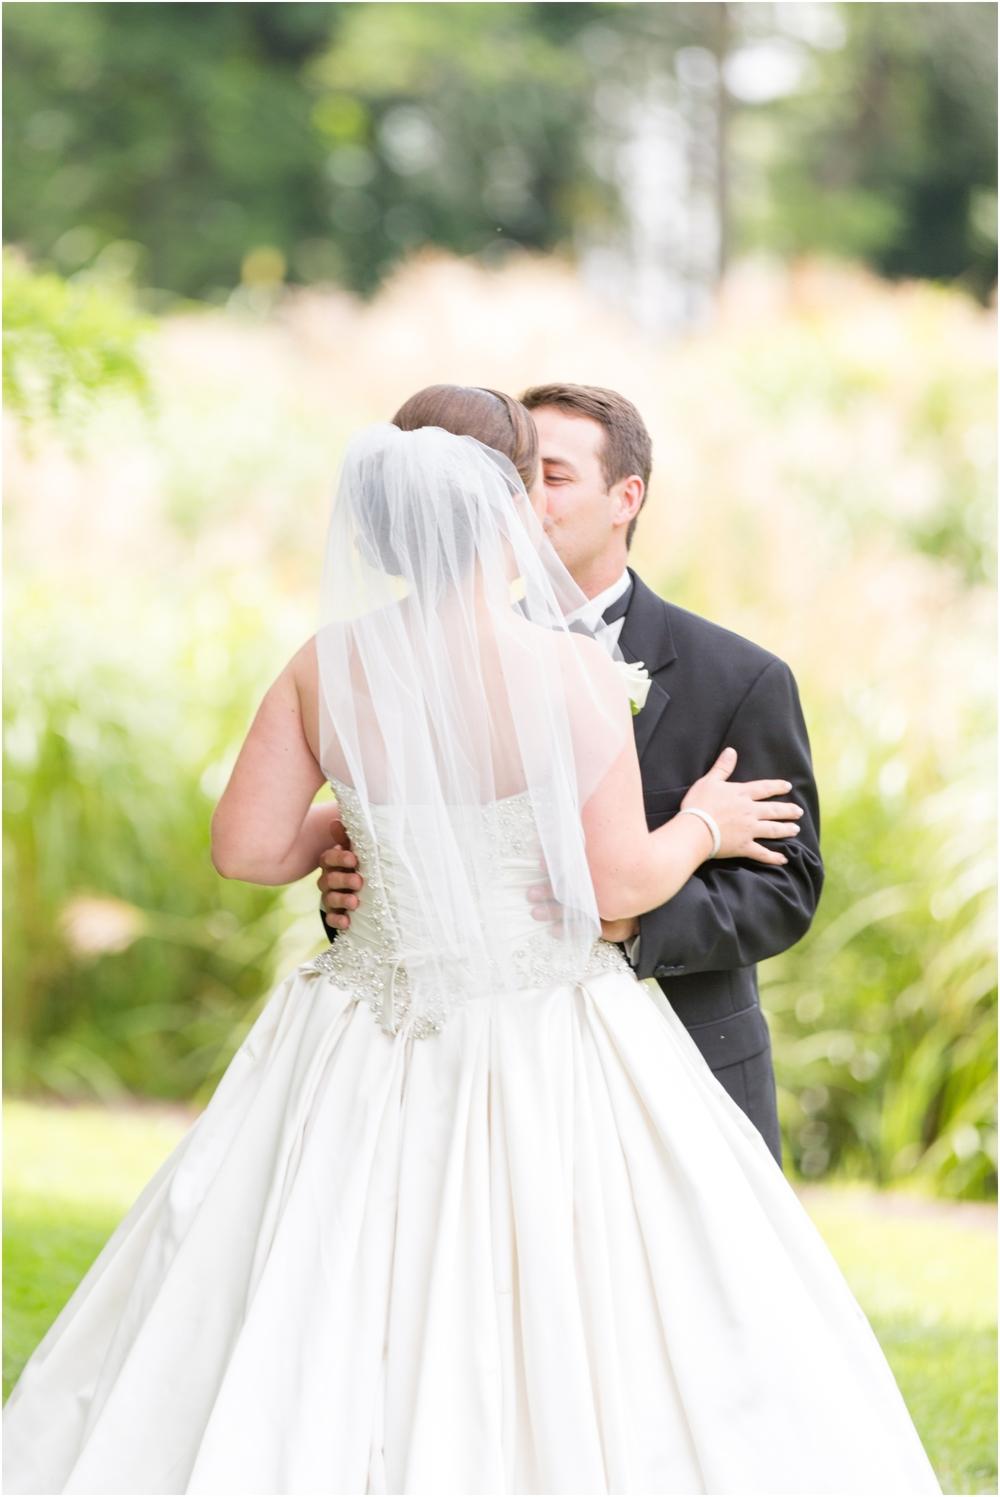 2-First-Look-Windsor-Wedding-239.jpg